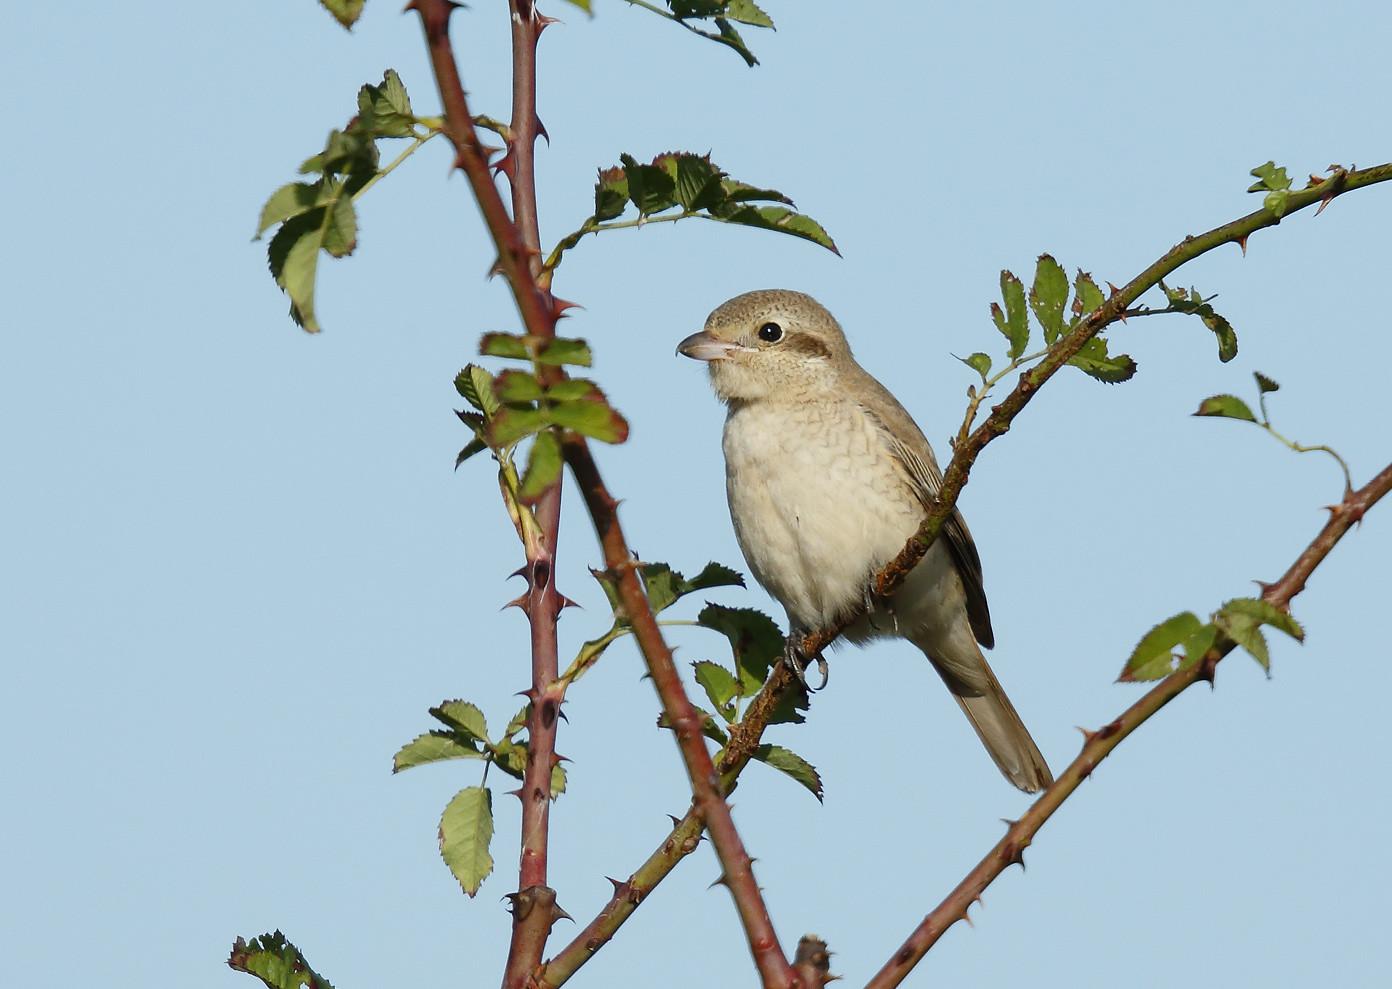 Isabelline [Daurian] Shrike